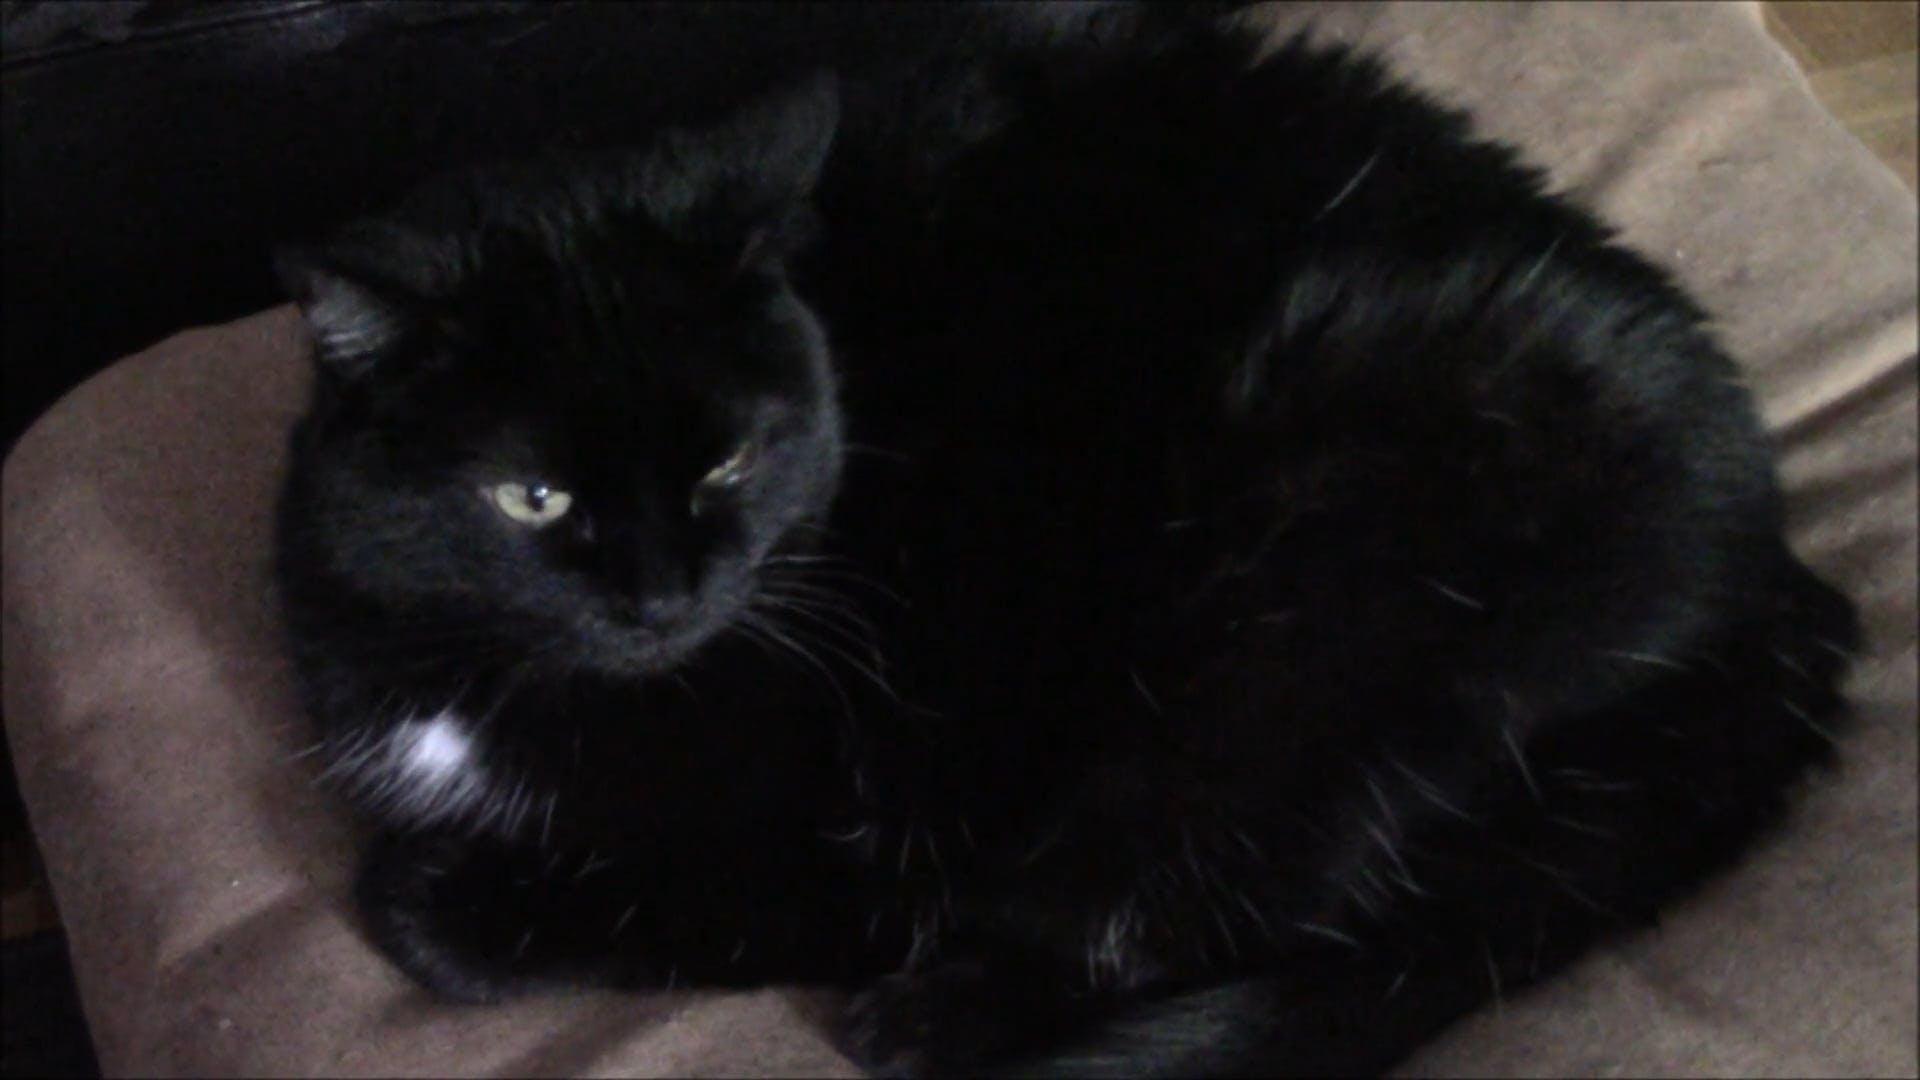 Video Of Black Cat Resting